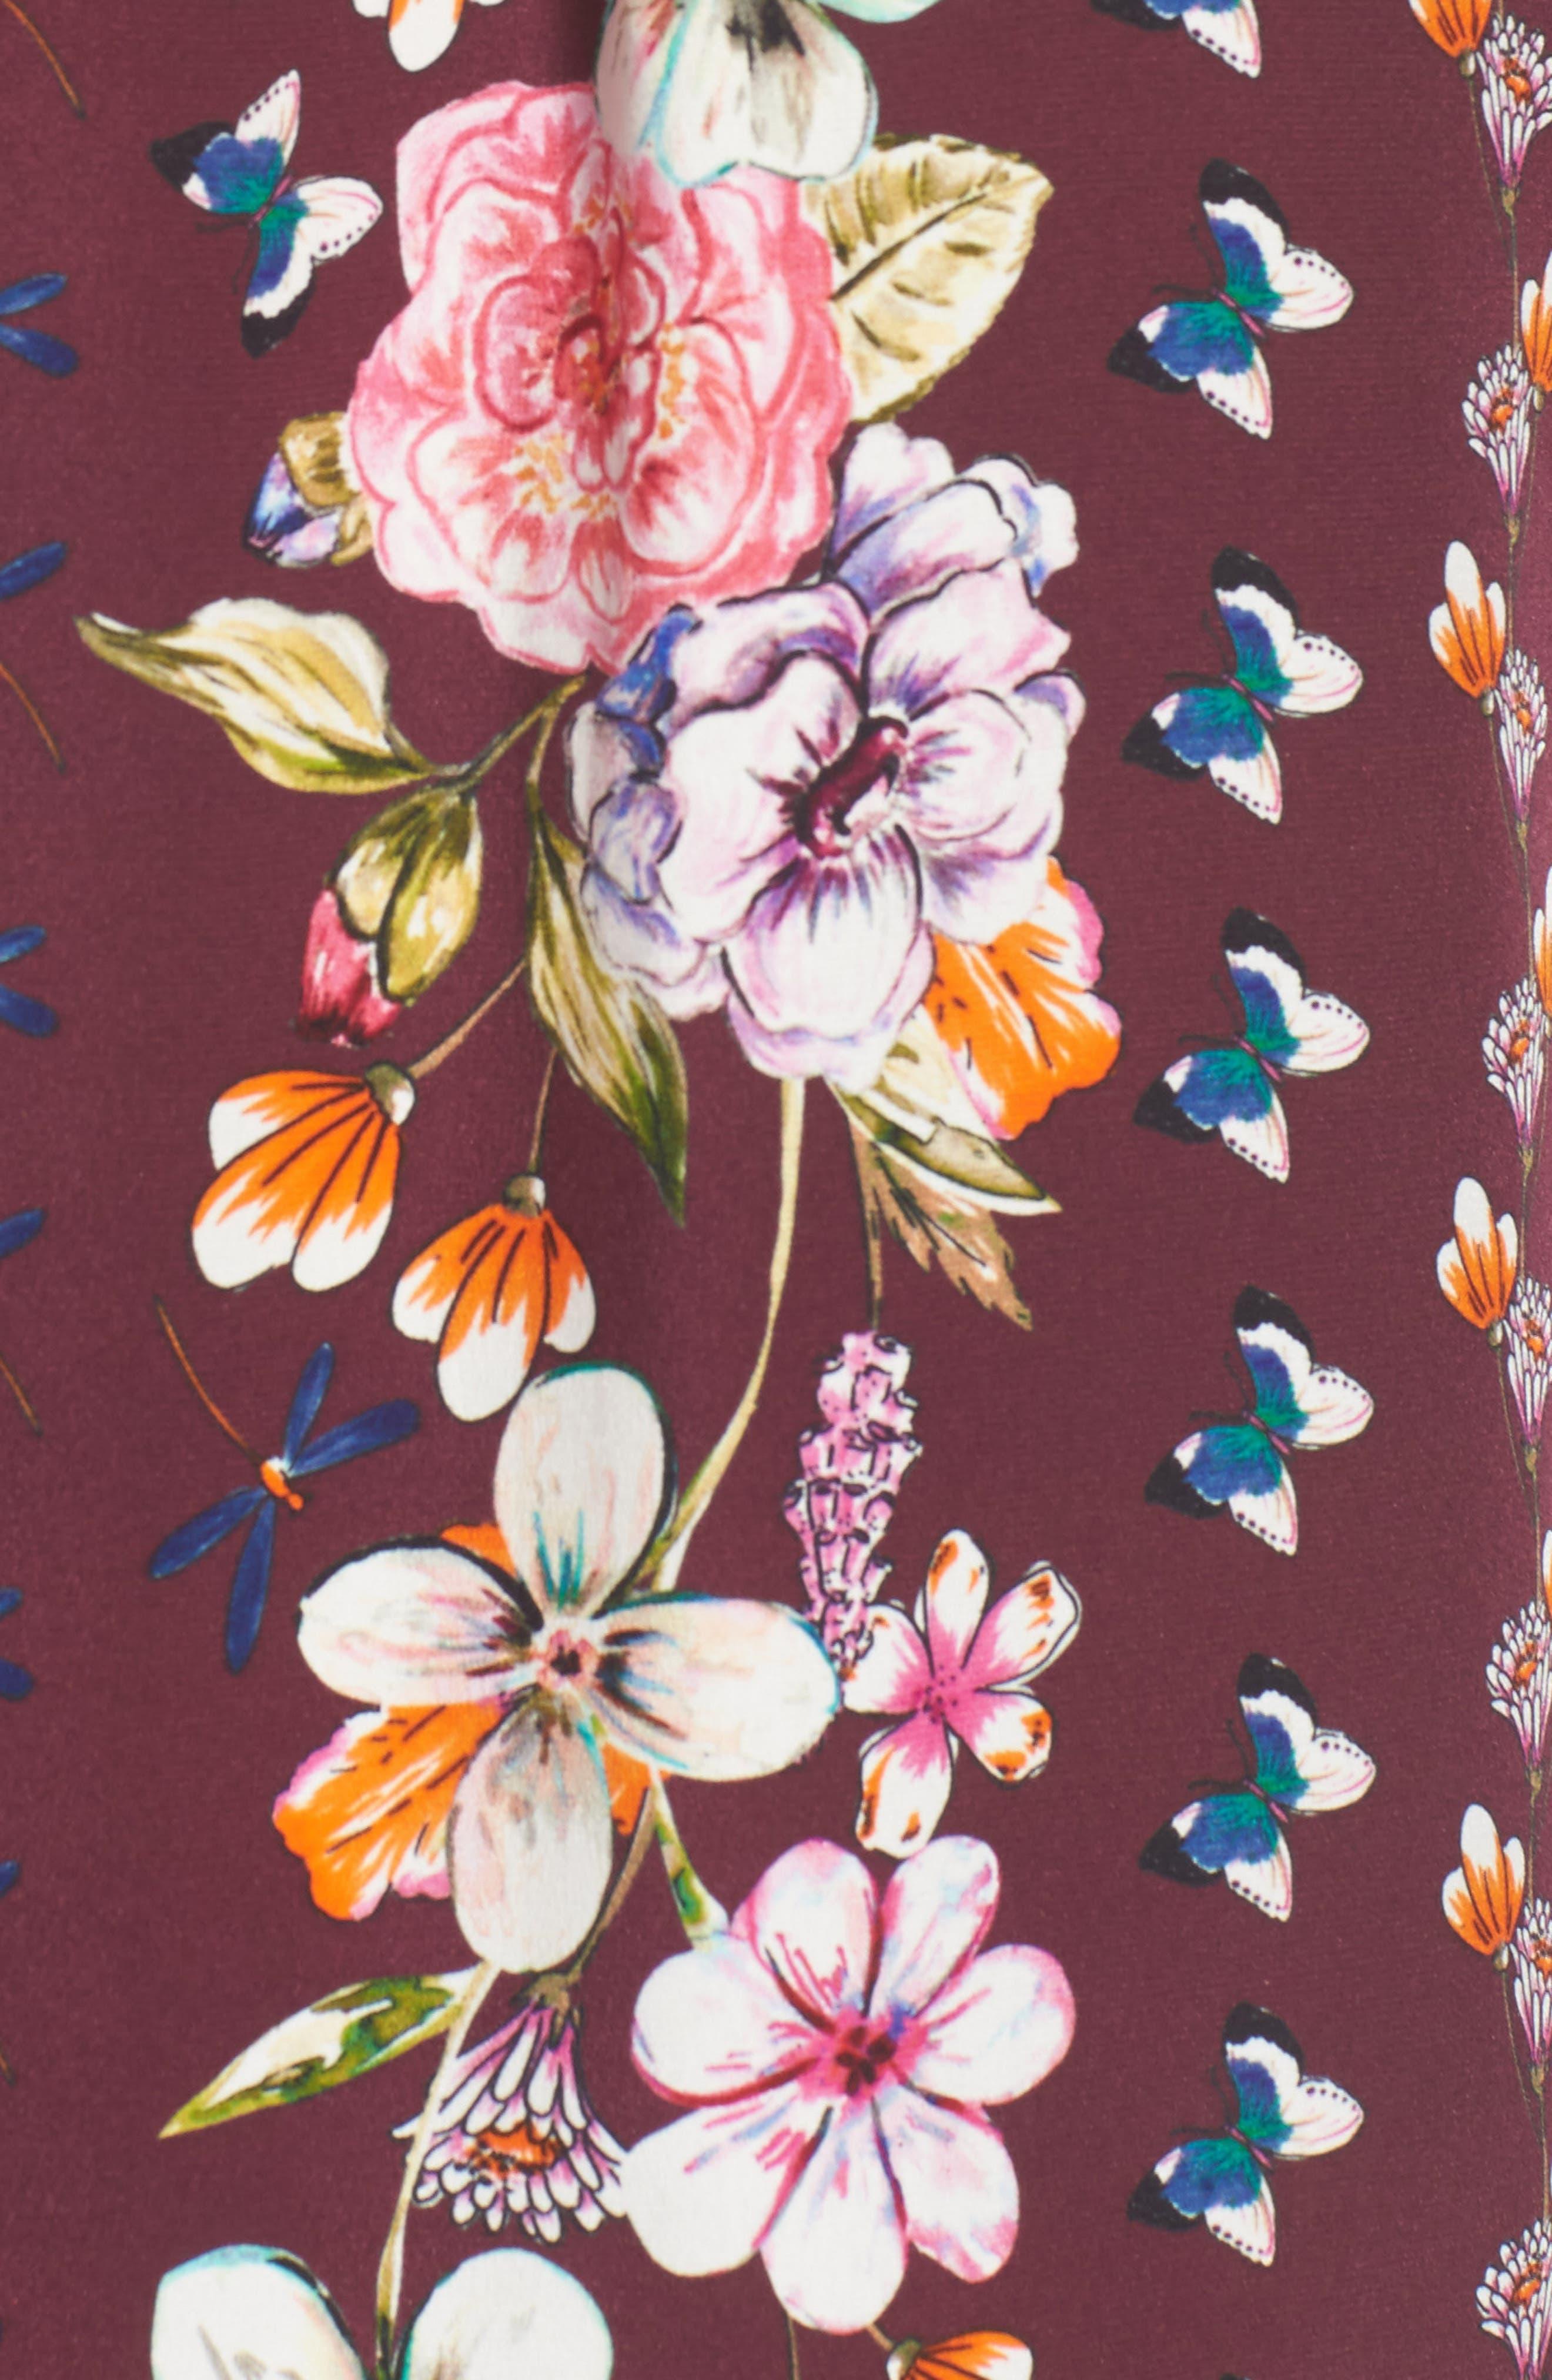 Kinsley Silk Blouse,                             Alternate thumbnail 5, color,                             932